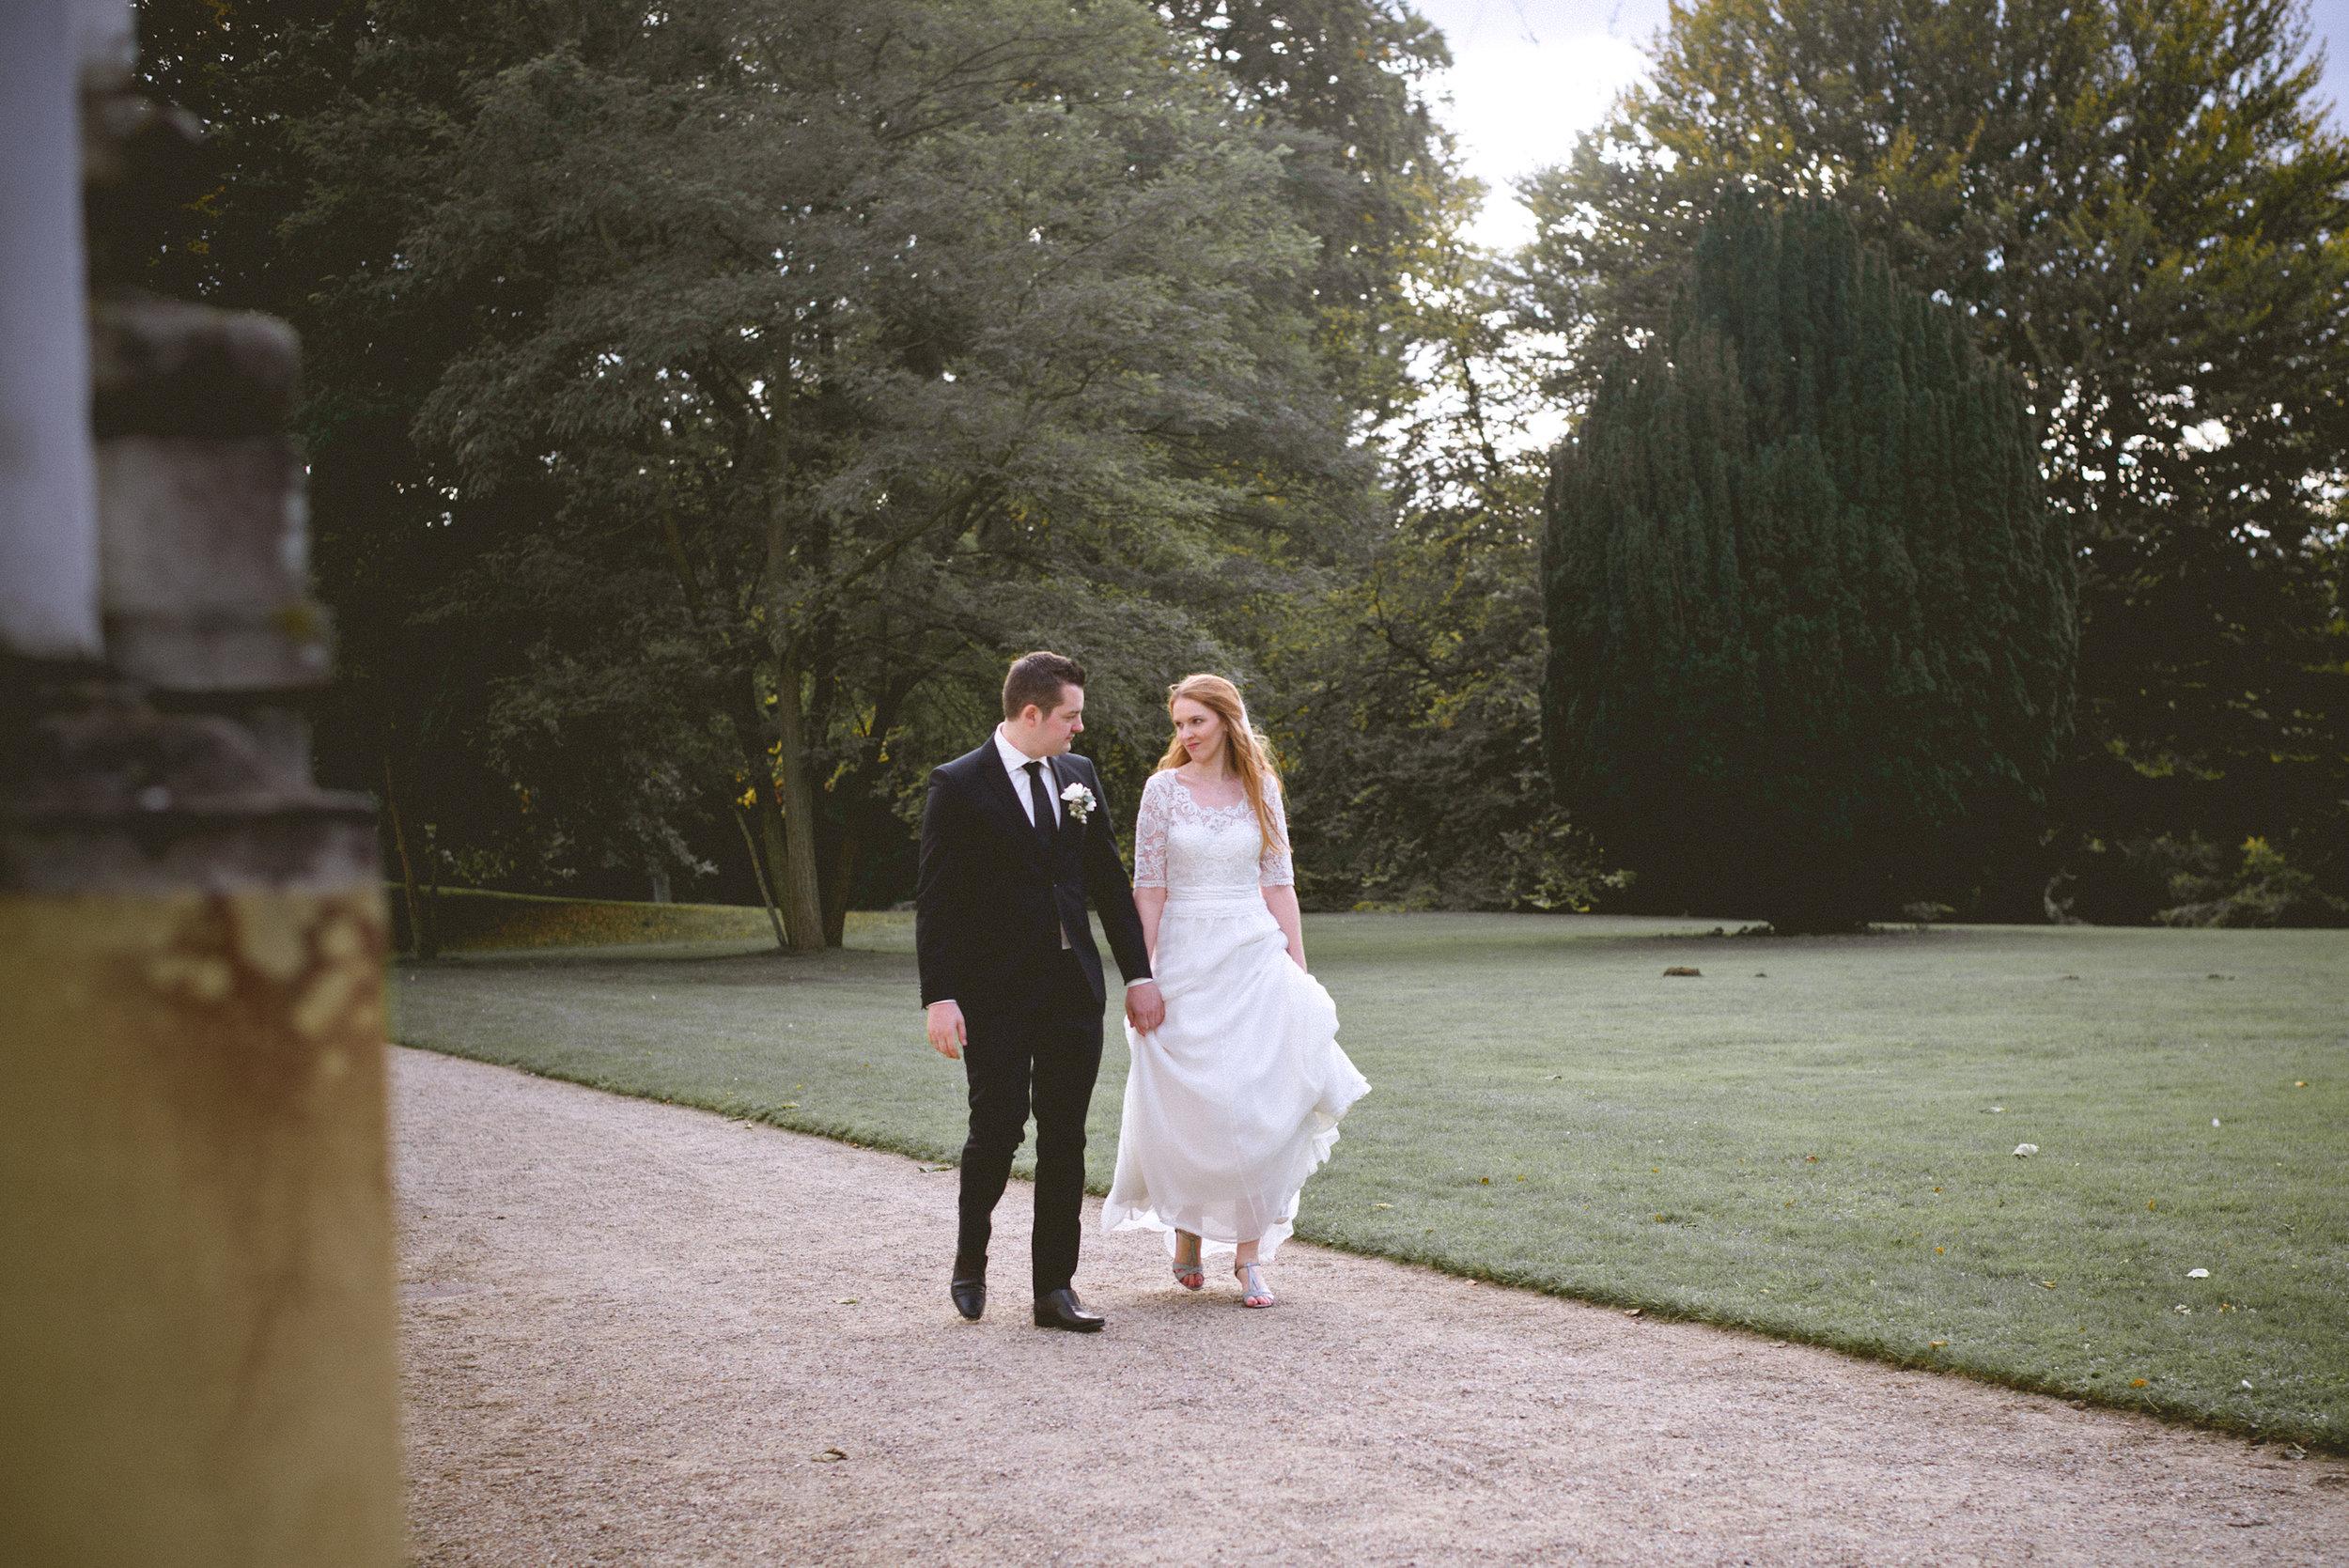 York Region Ontario Wedding Photographer - Bride + Groom-56.jpg